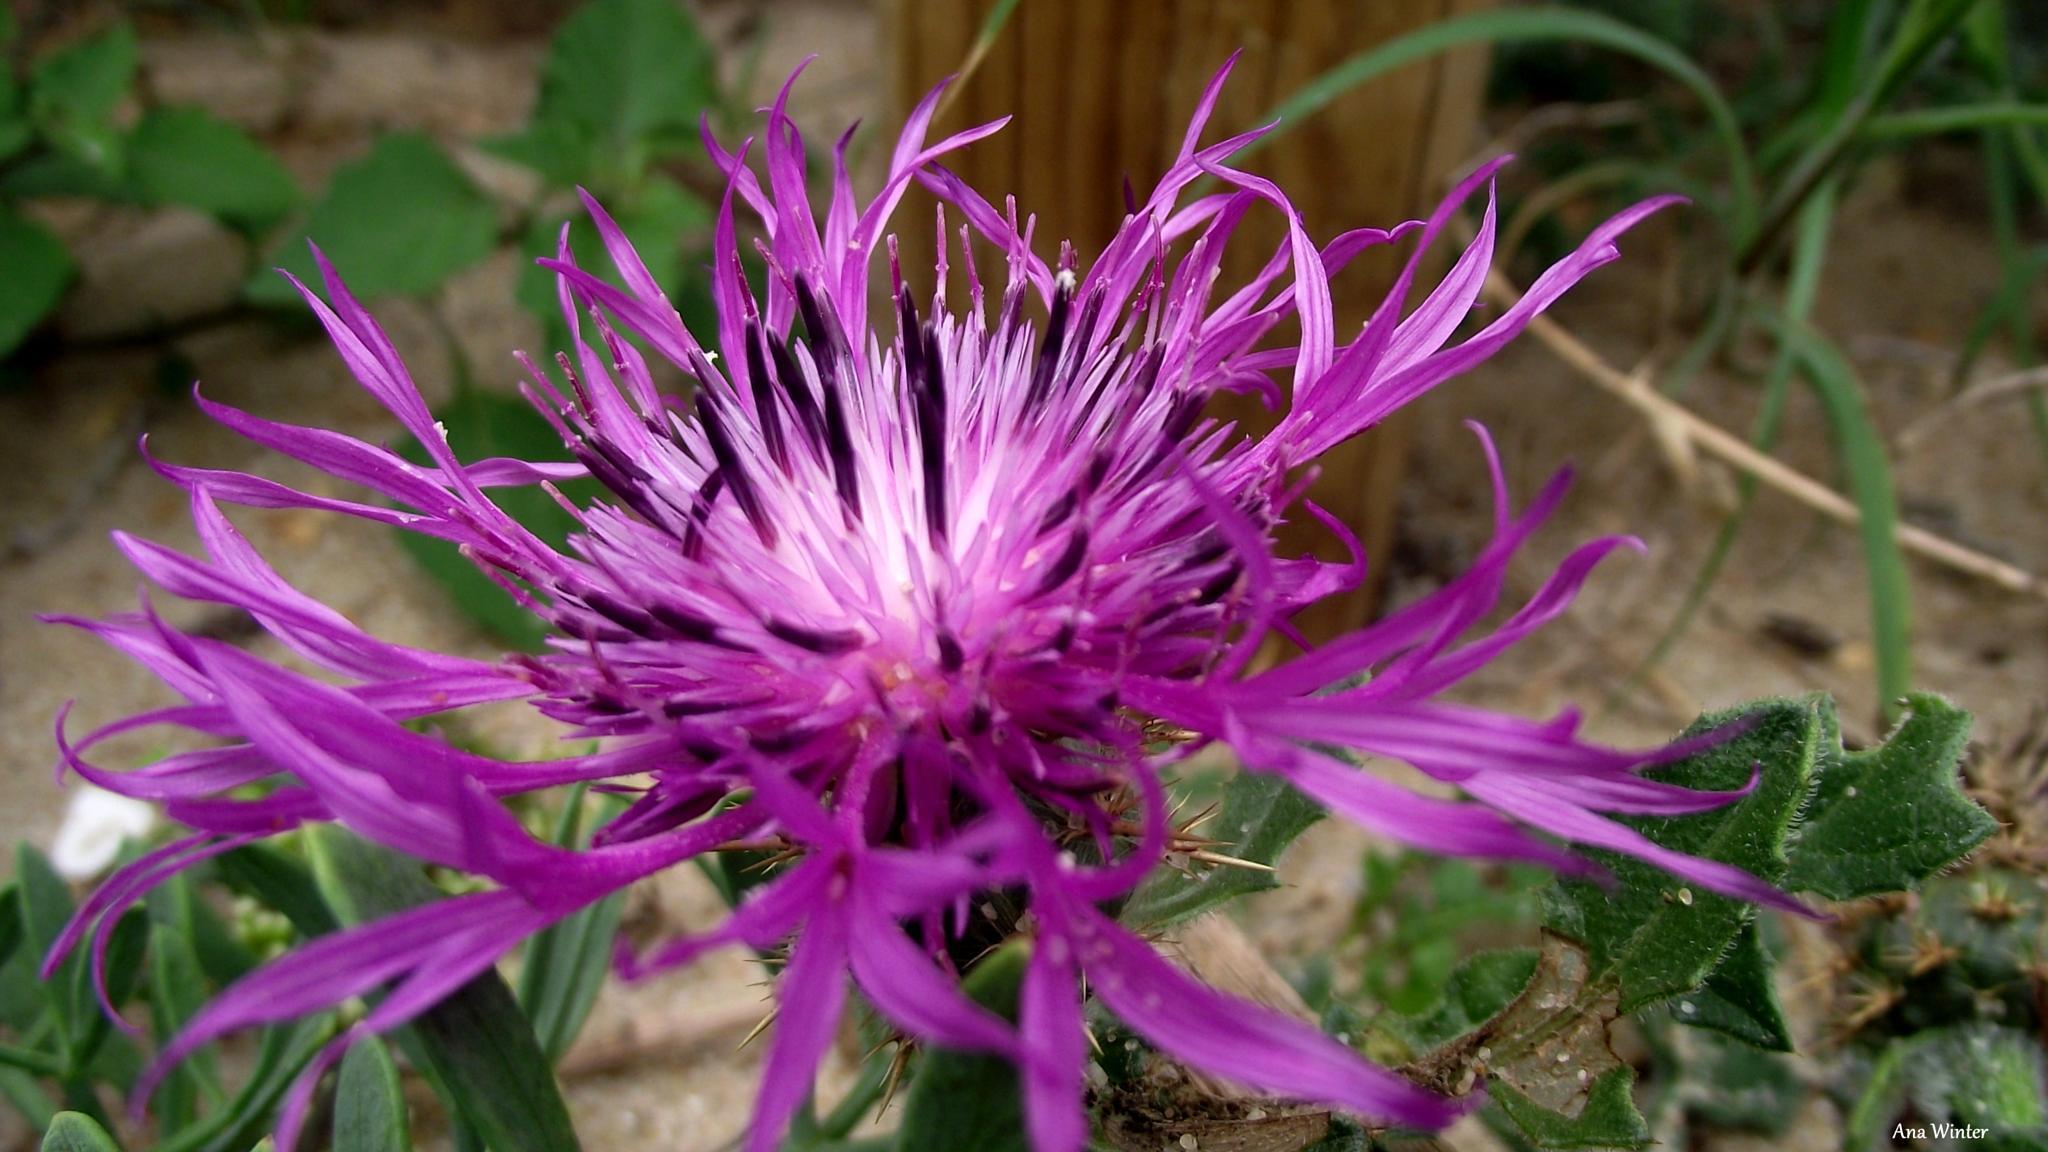 Interesting flower by Ana Winter